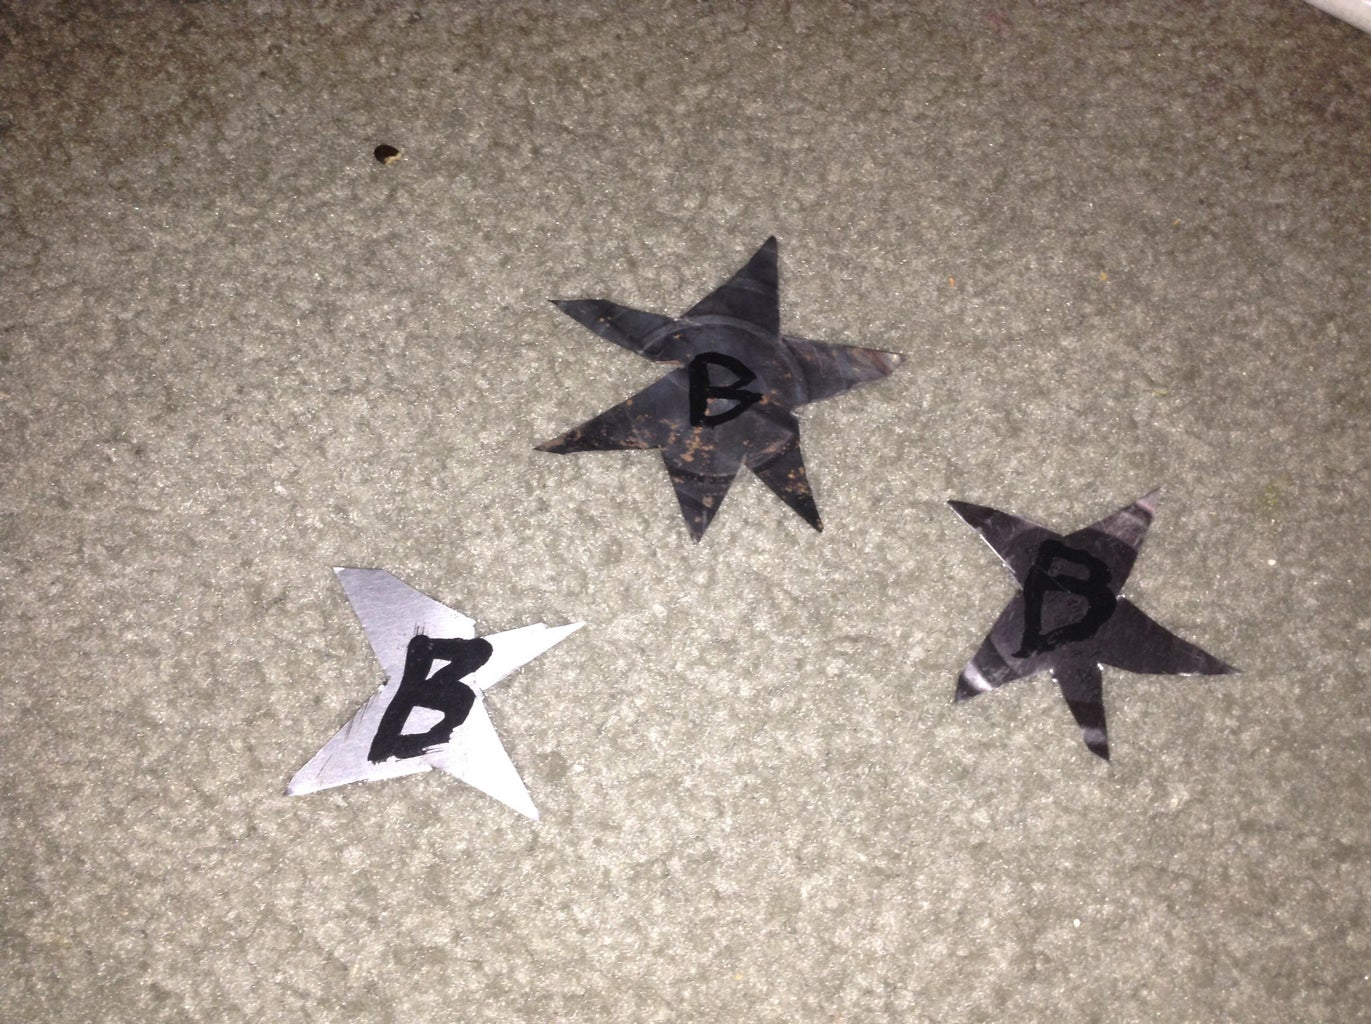 How to Make Ninja Stars